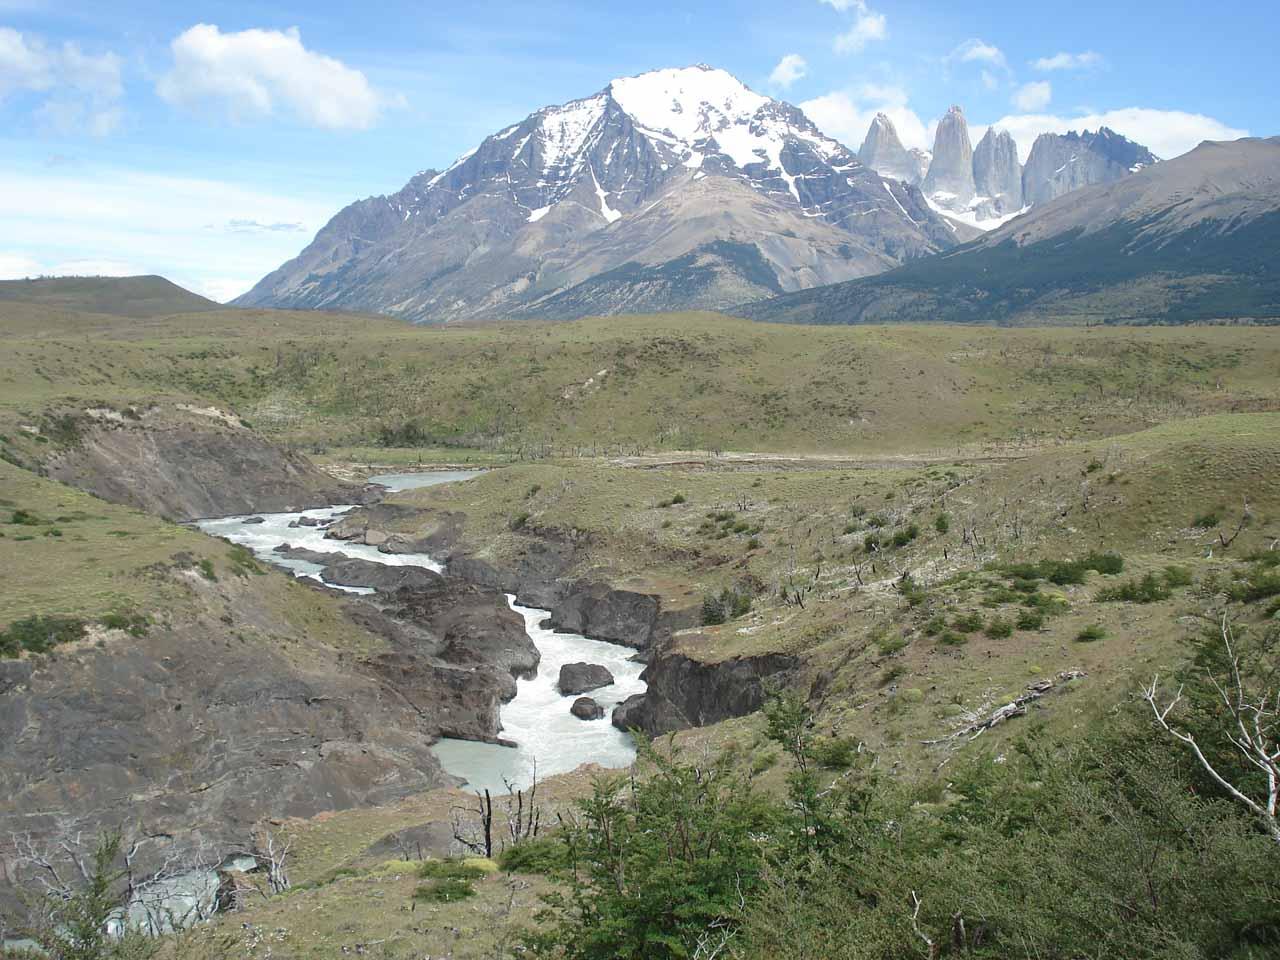 Cascades del Rio Paine fronting Las Torres del Paine